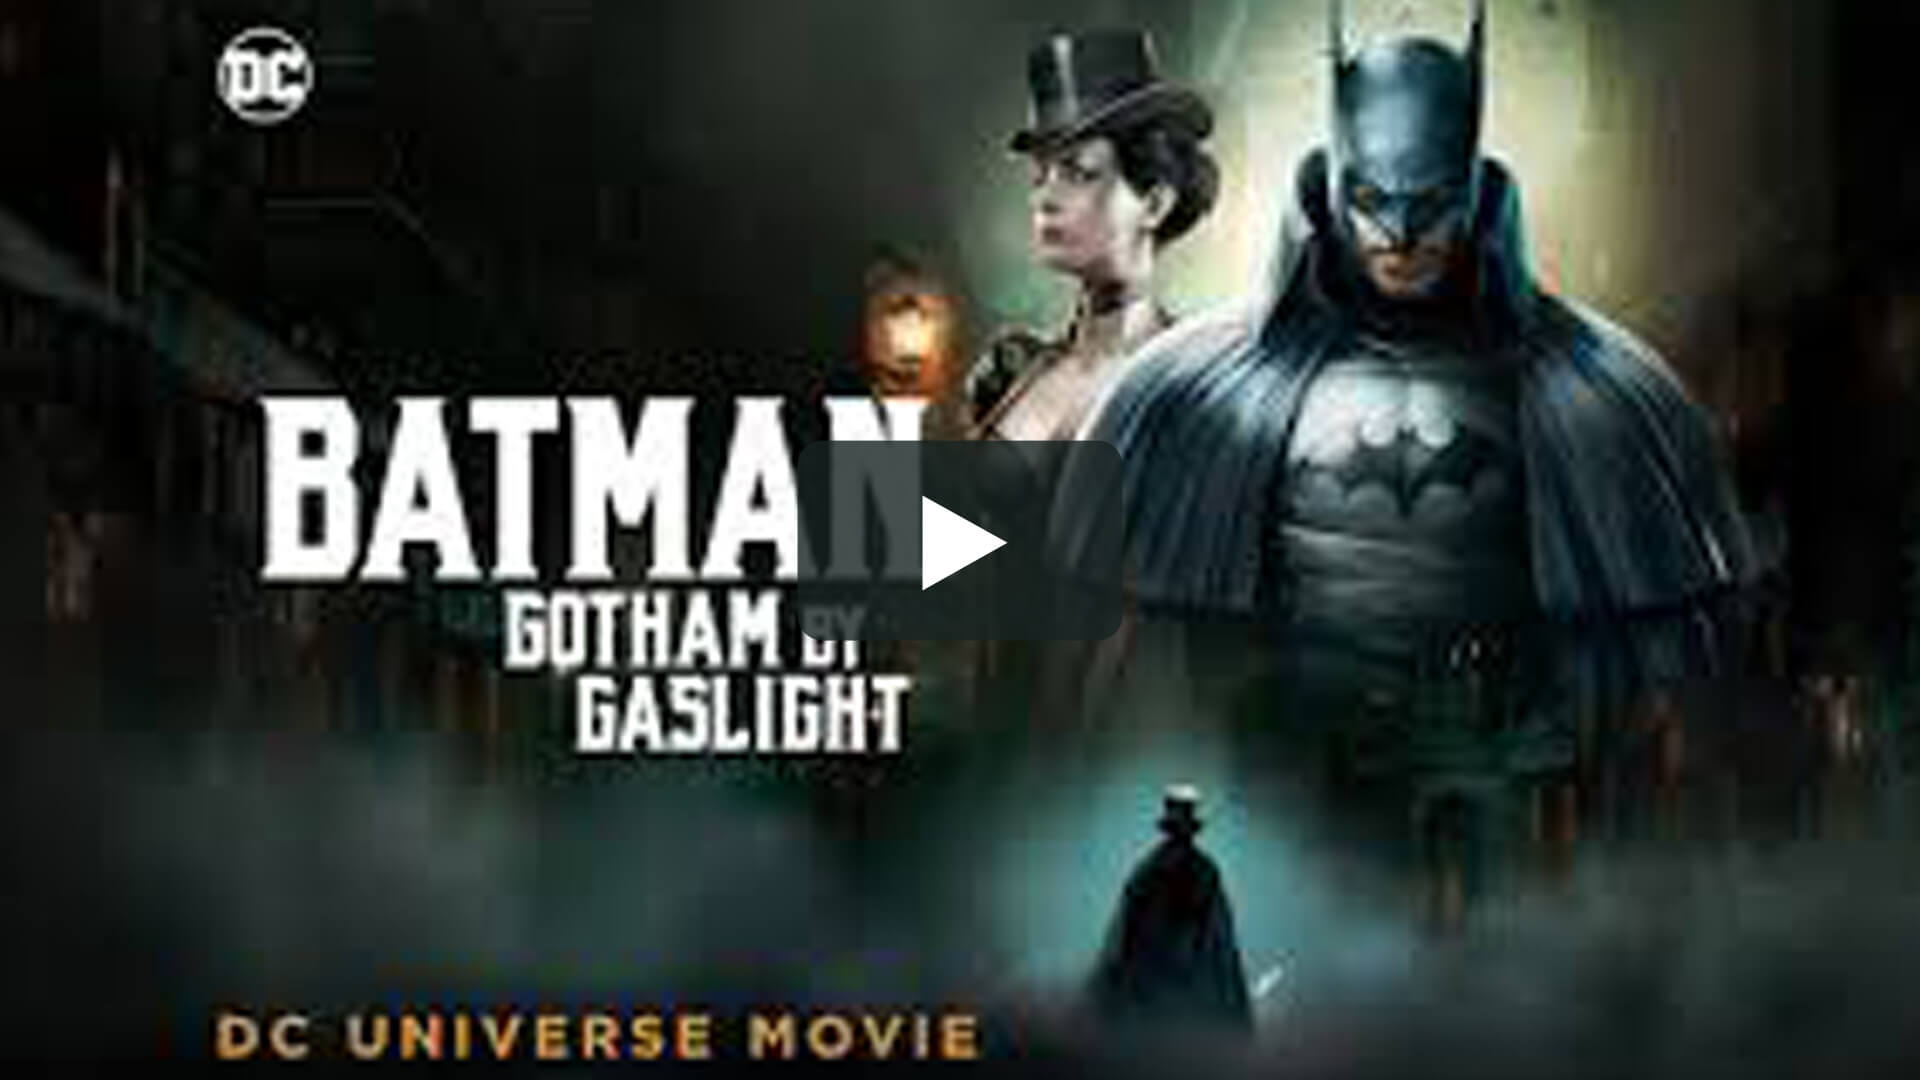 Batman: Gotham by Gaslight - 蝙蝠俠:煤氣燈下的哥譚